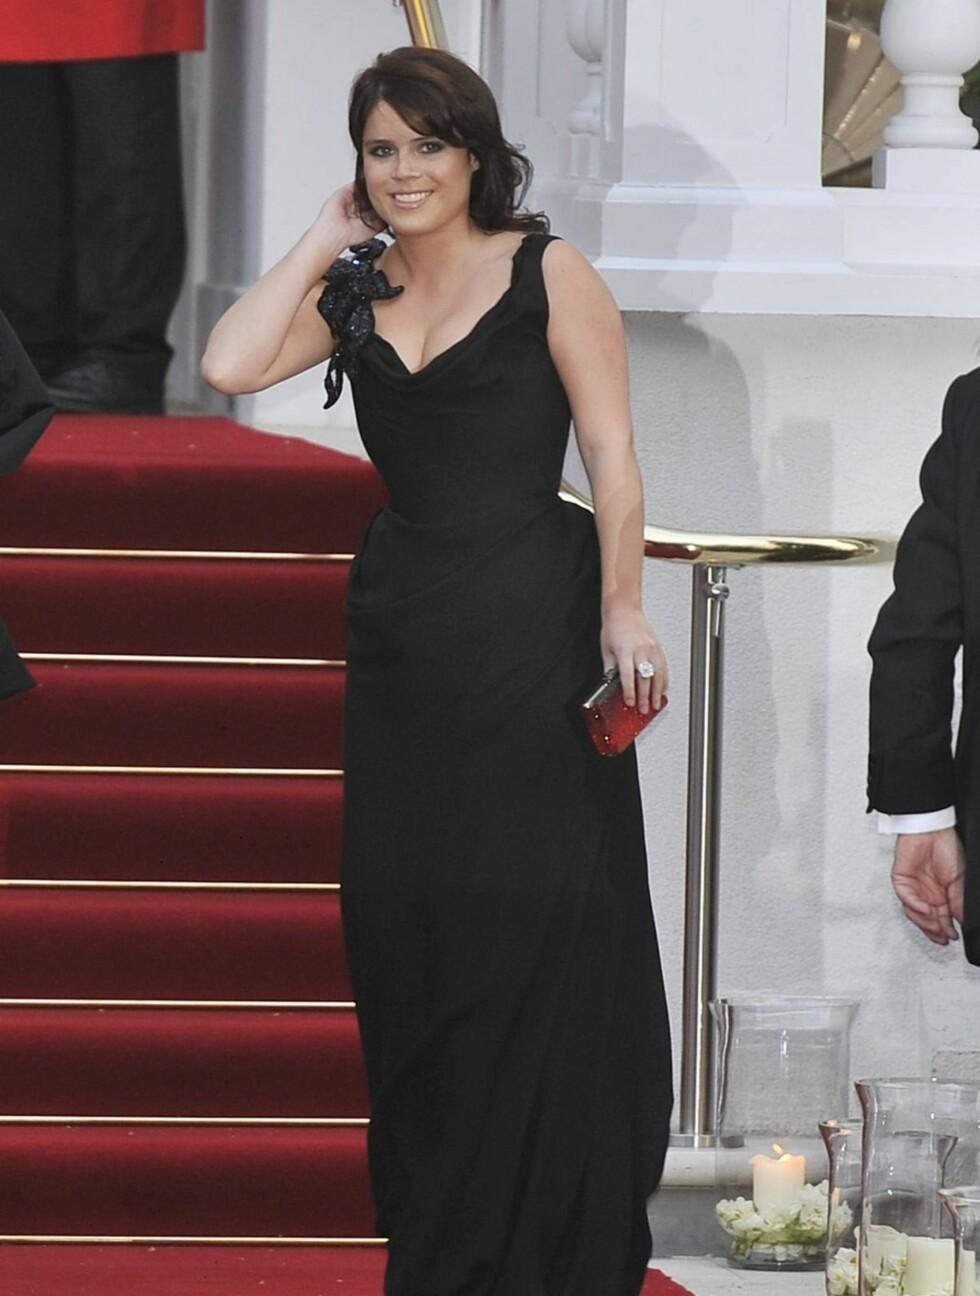 PÅ FEST: Datteren til prins Andrew og Sarah Ferguson, prinsesse Eugenie. Foto: Stella Pictures